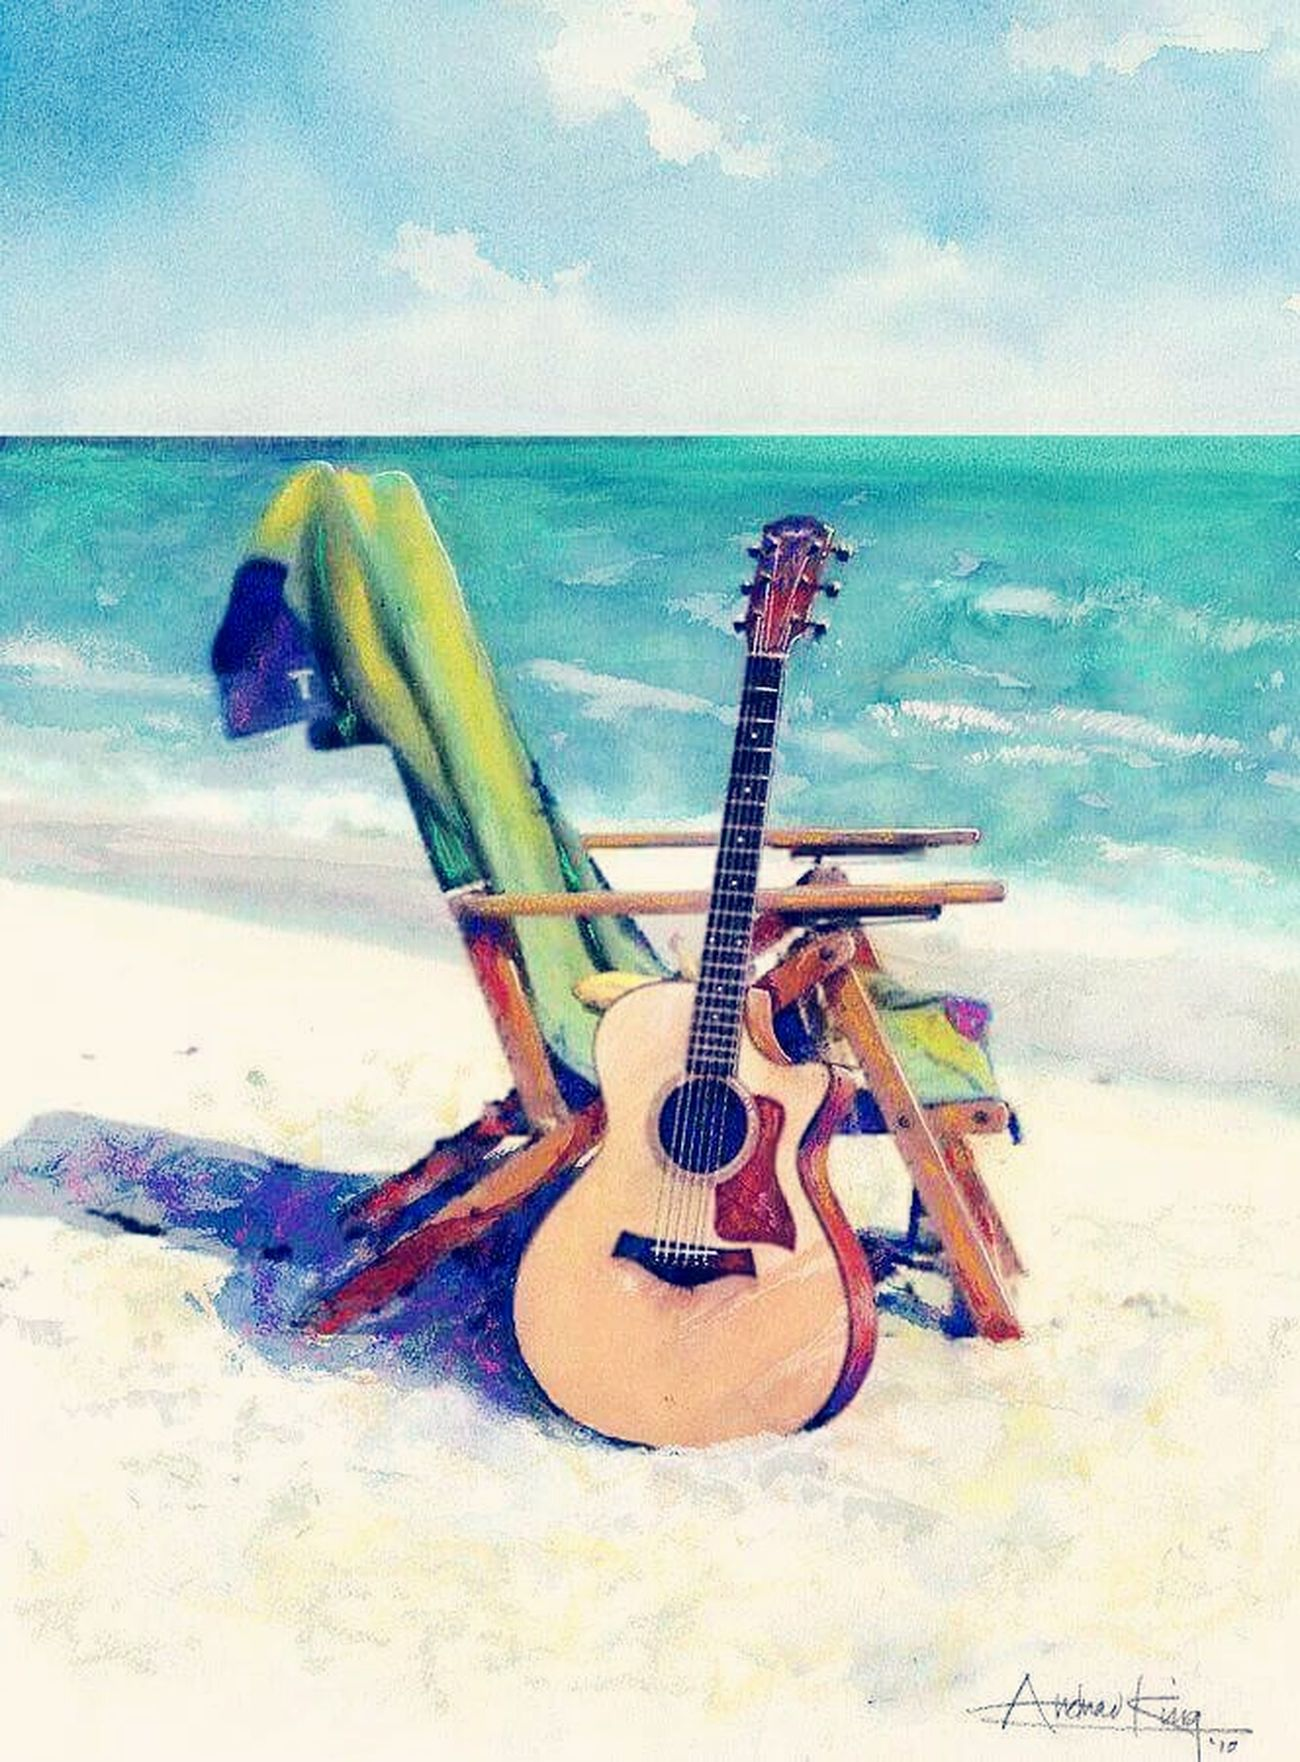 Beach&music Guitar, Diversión. OpenEdit Gallery EyeEm Gallery Enjoying Life Hi! Gold Series @txemabuenodaz Playa Del Sardinero, Santander. Hello World Taking Photos